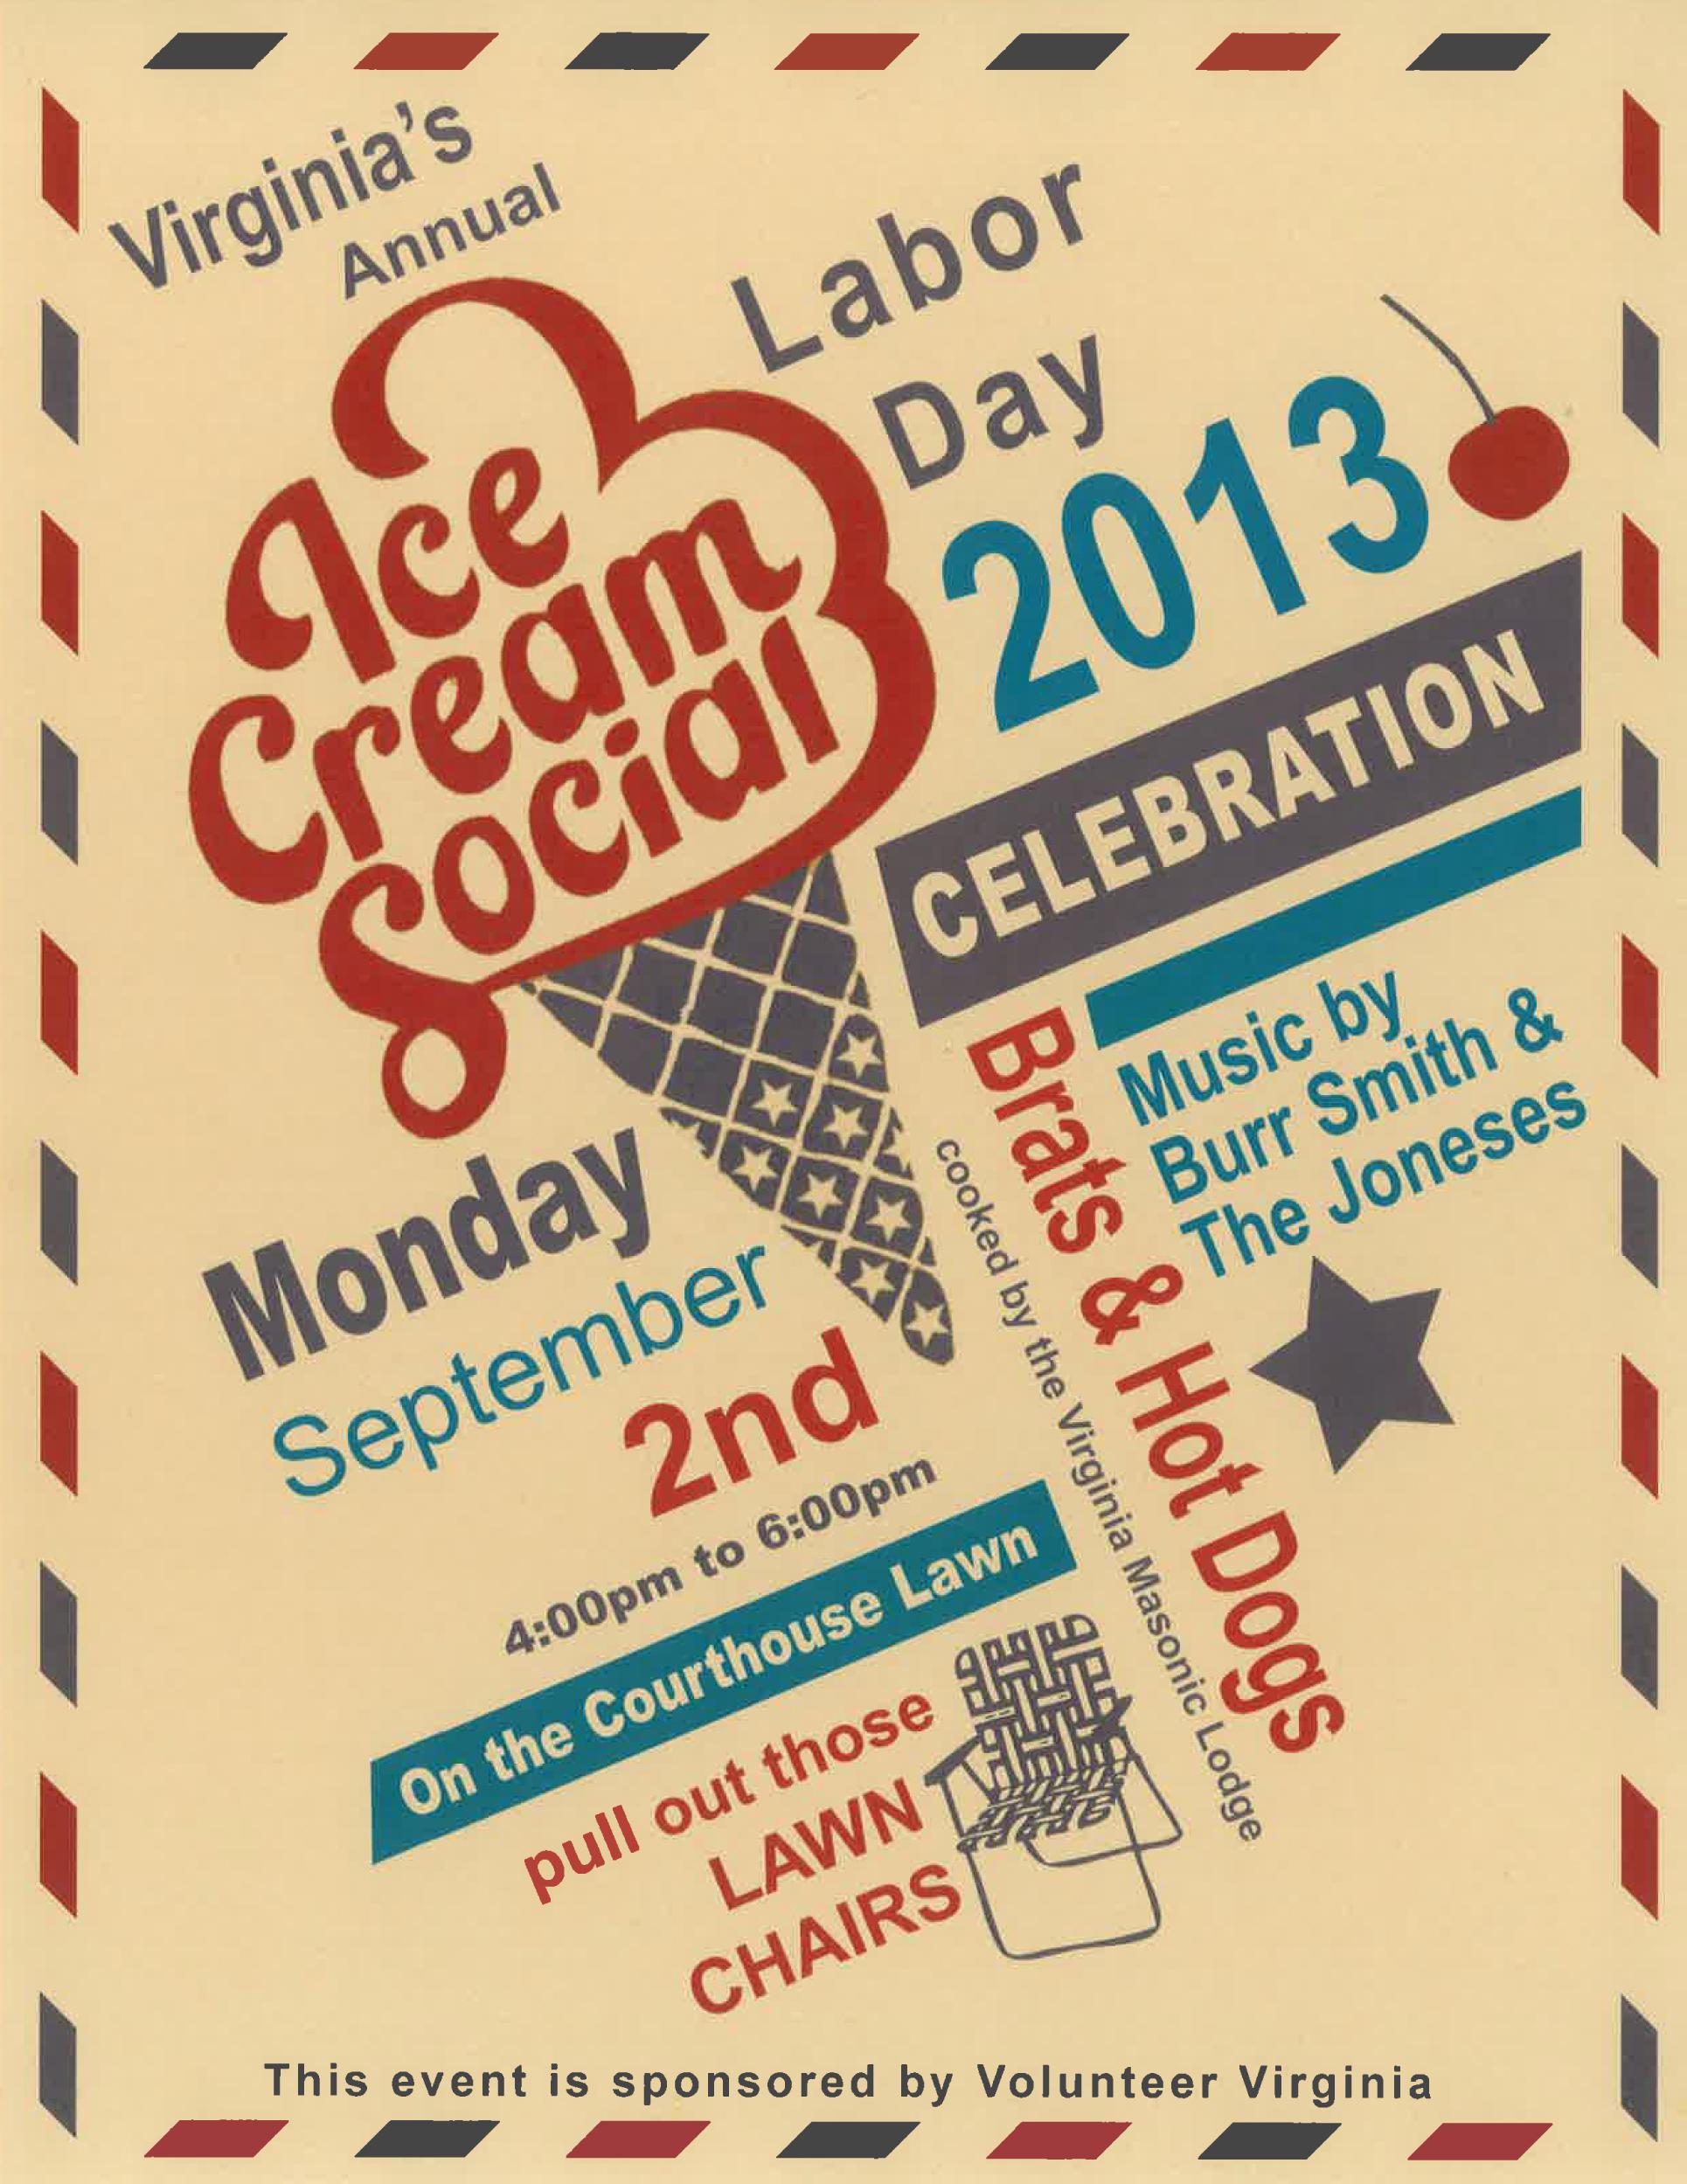 Ice Cream social Flyer Fresh Labor Day 2013 Flyer